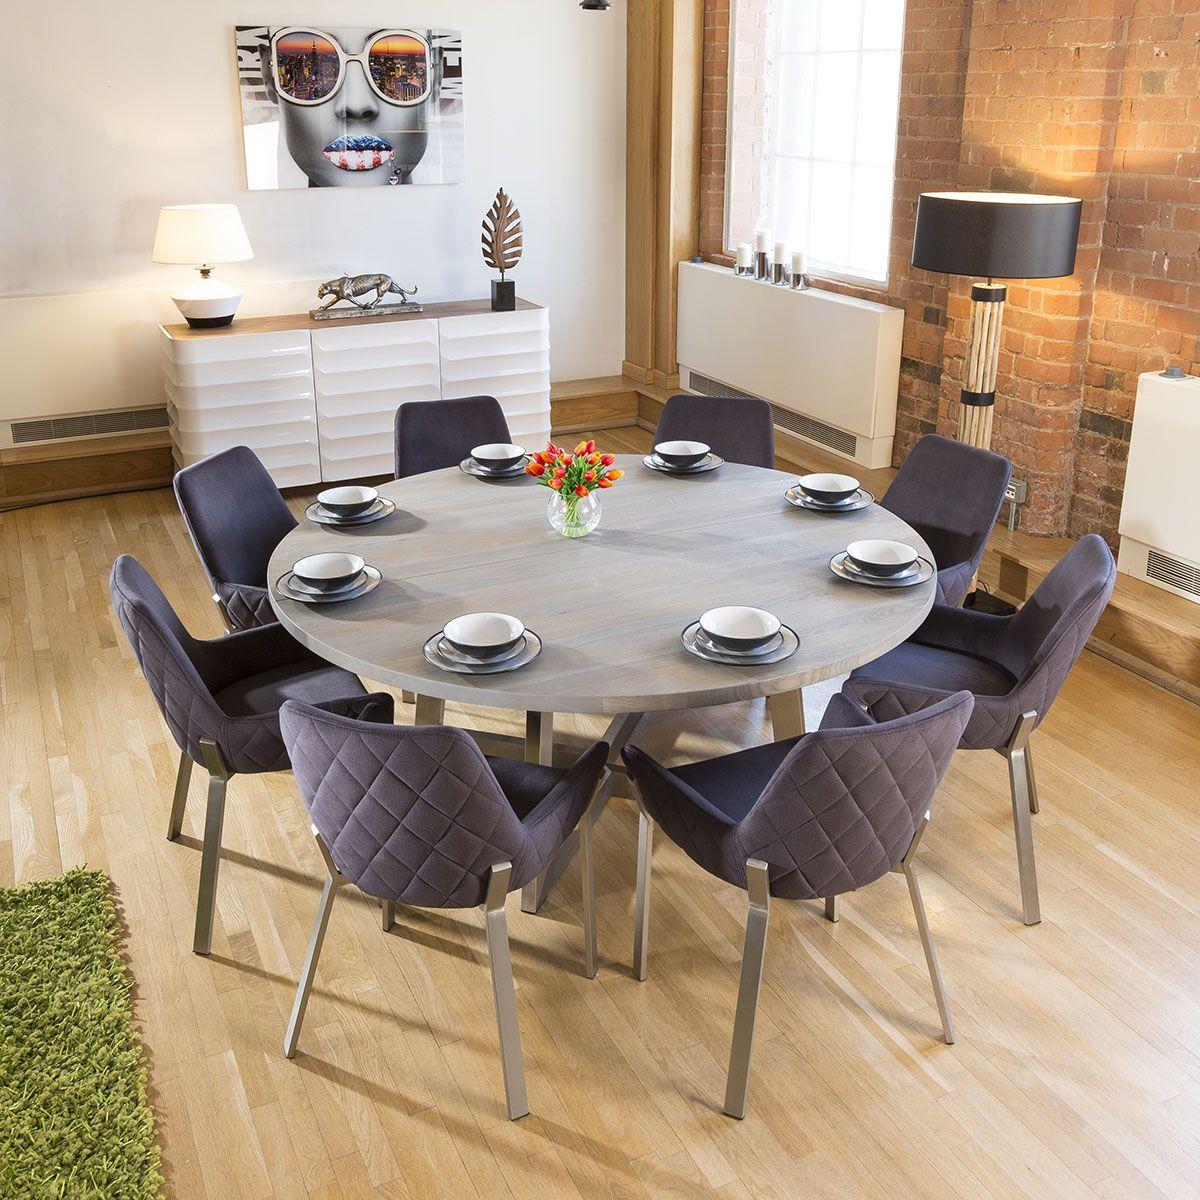 Massive Circular 1 8m Grey Oak Dining Table 8 Dark Grey Carver